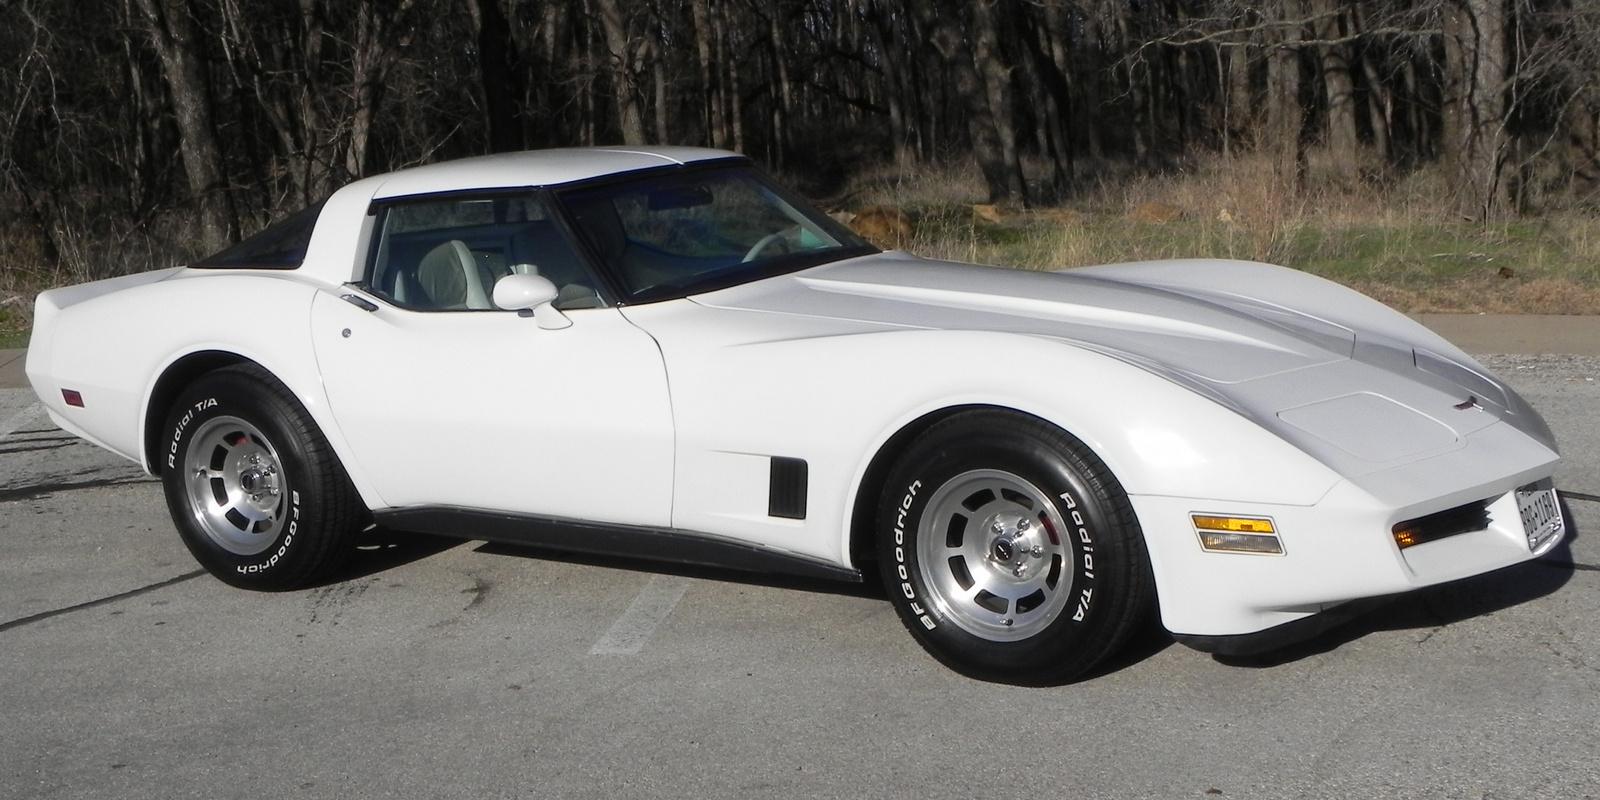 1980 Chevrolet Corvette Pictures C437 pi36425699